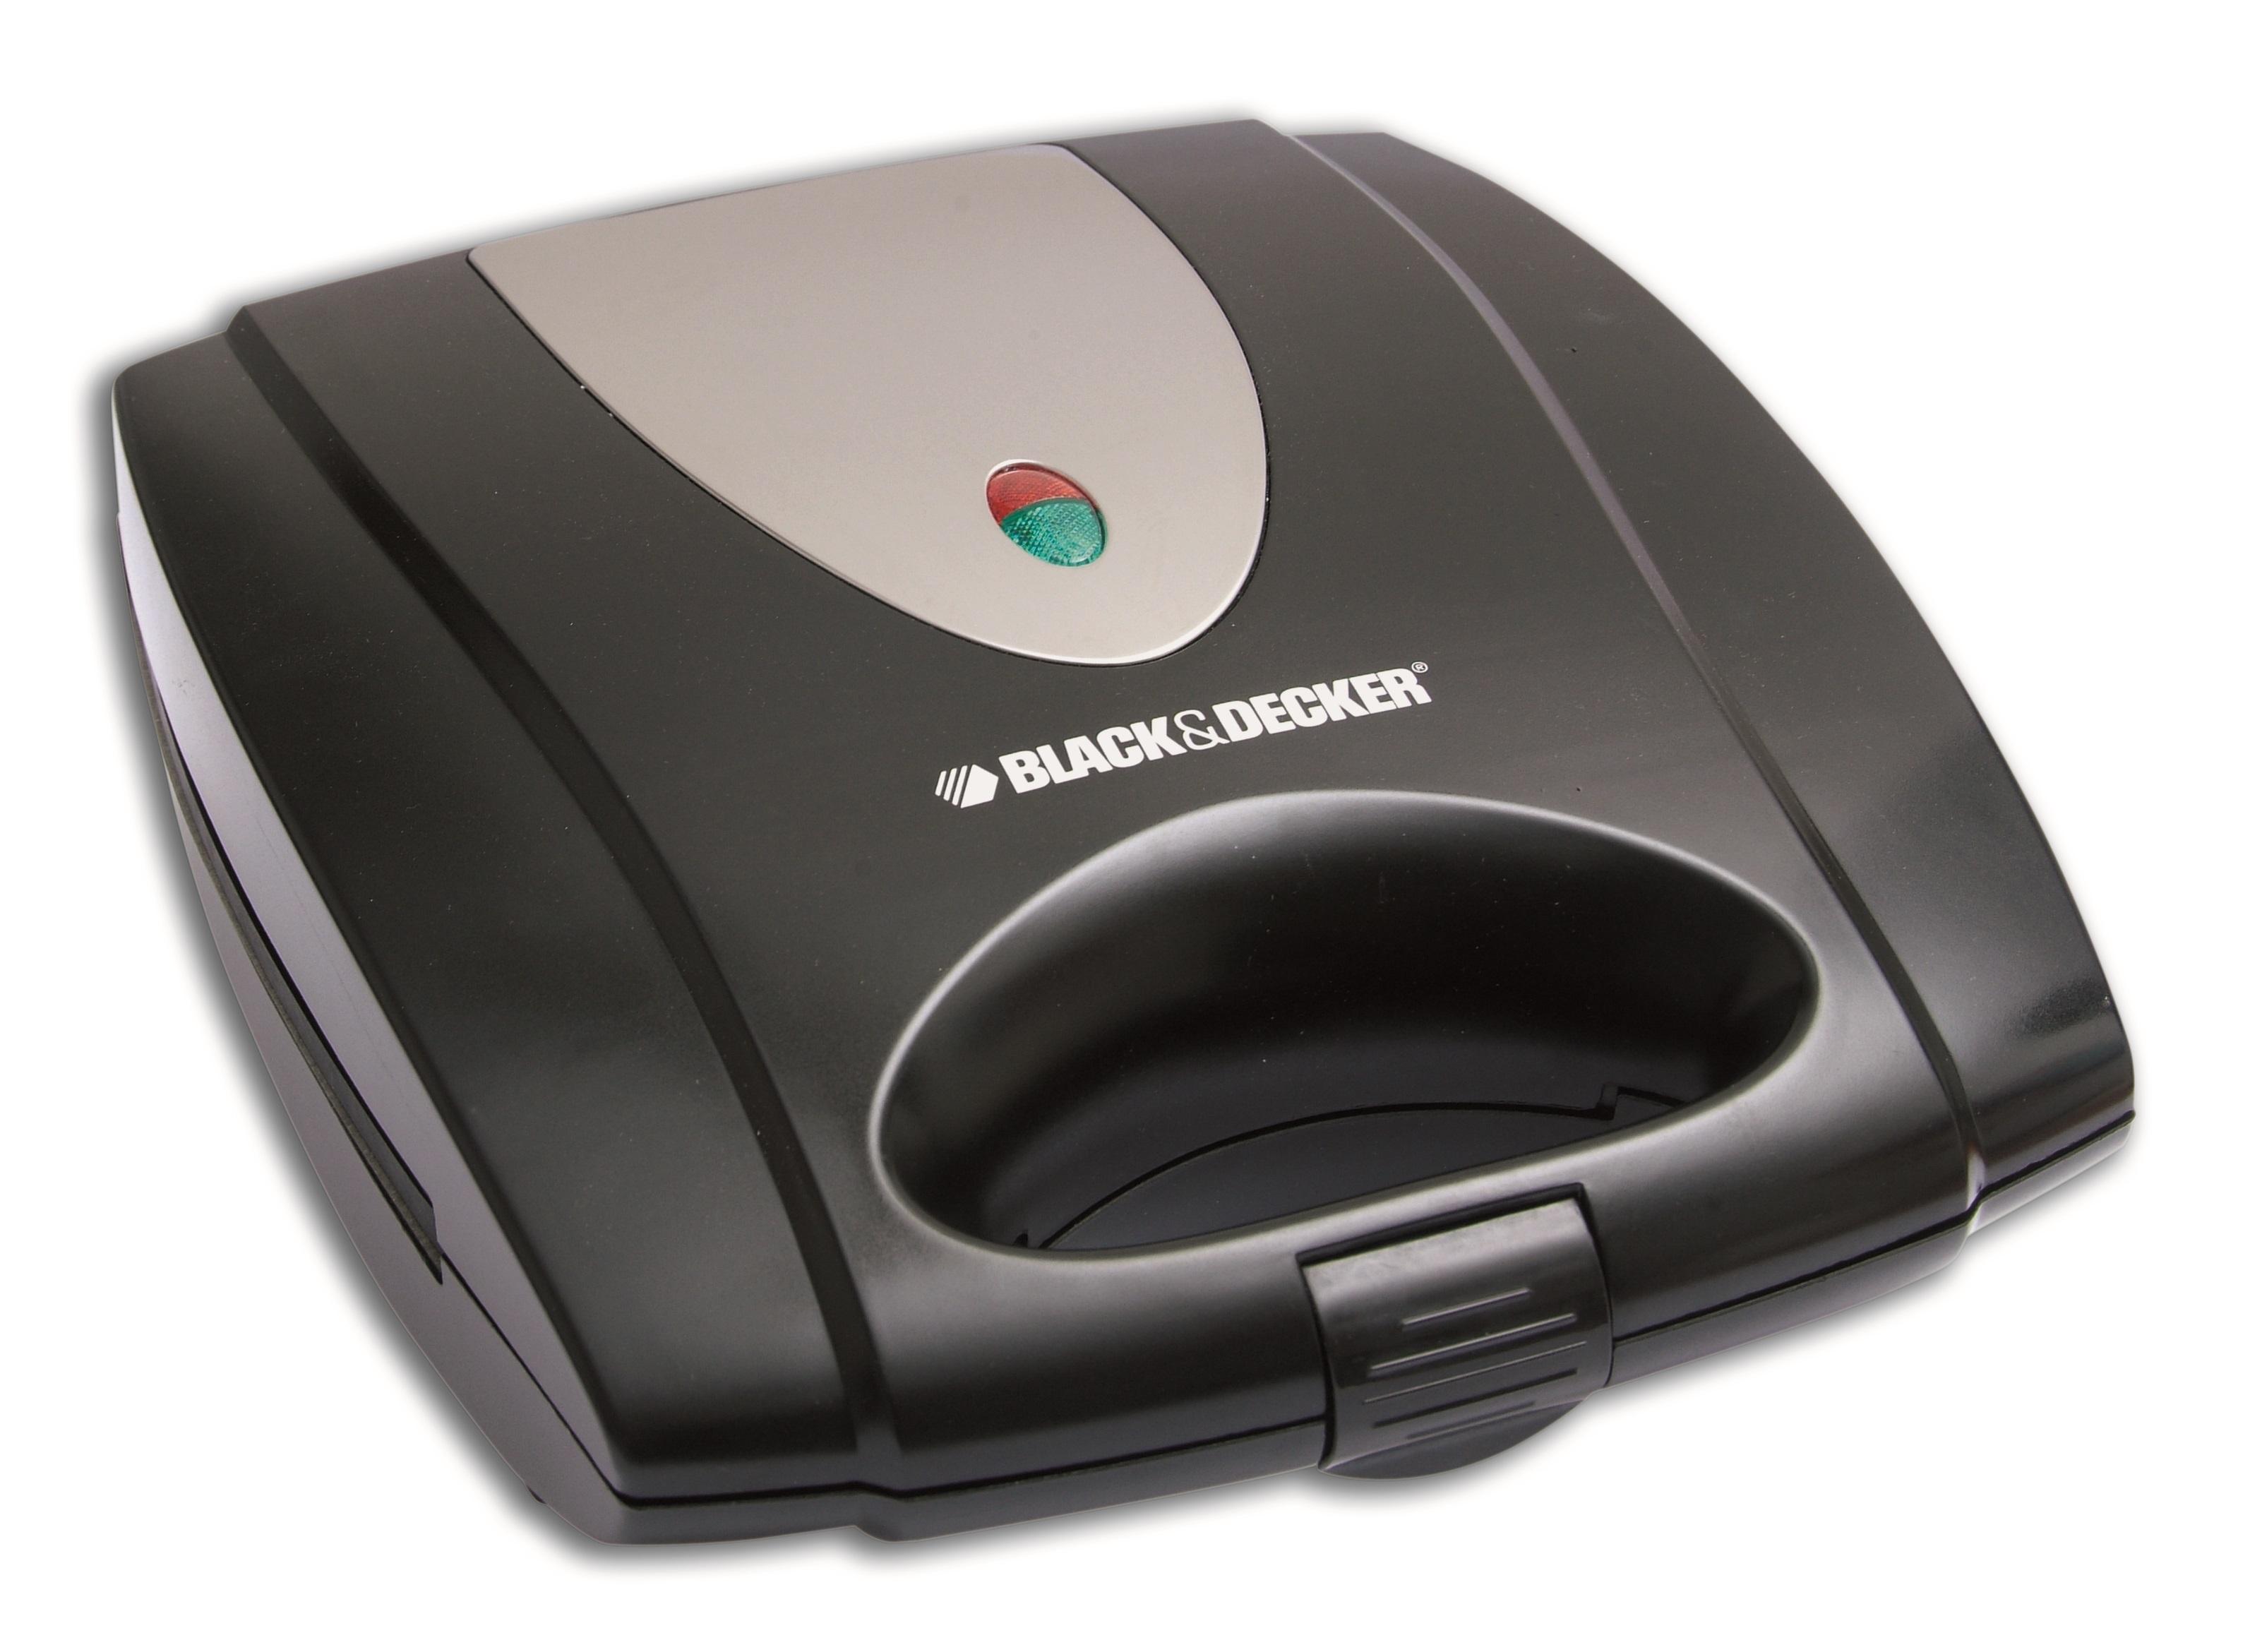 Black & Decker 4 Slot Sandwich Maker - Black, TS4080-B5